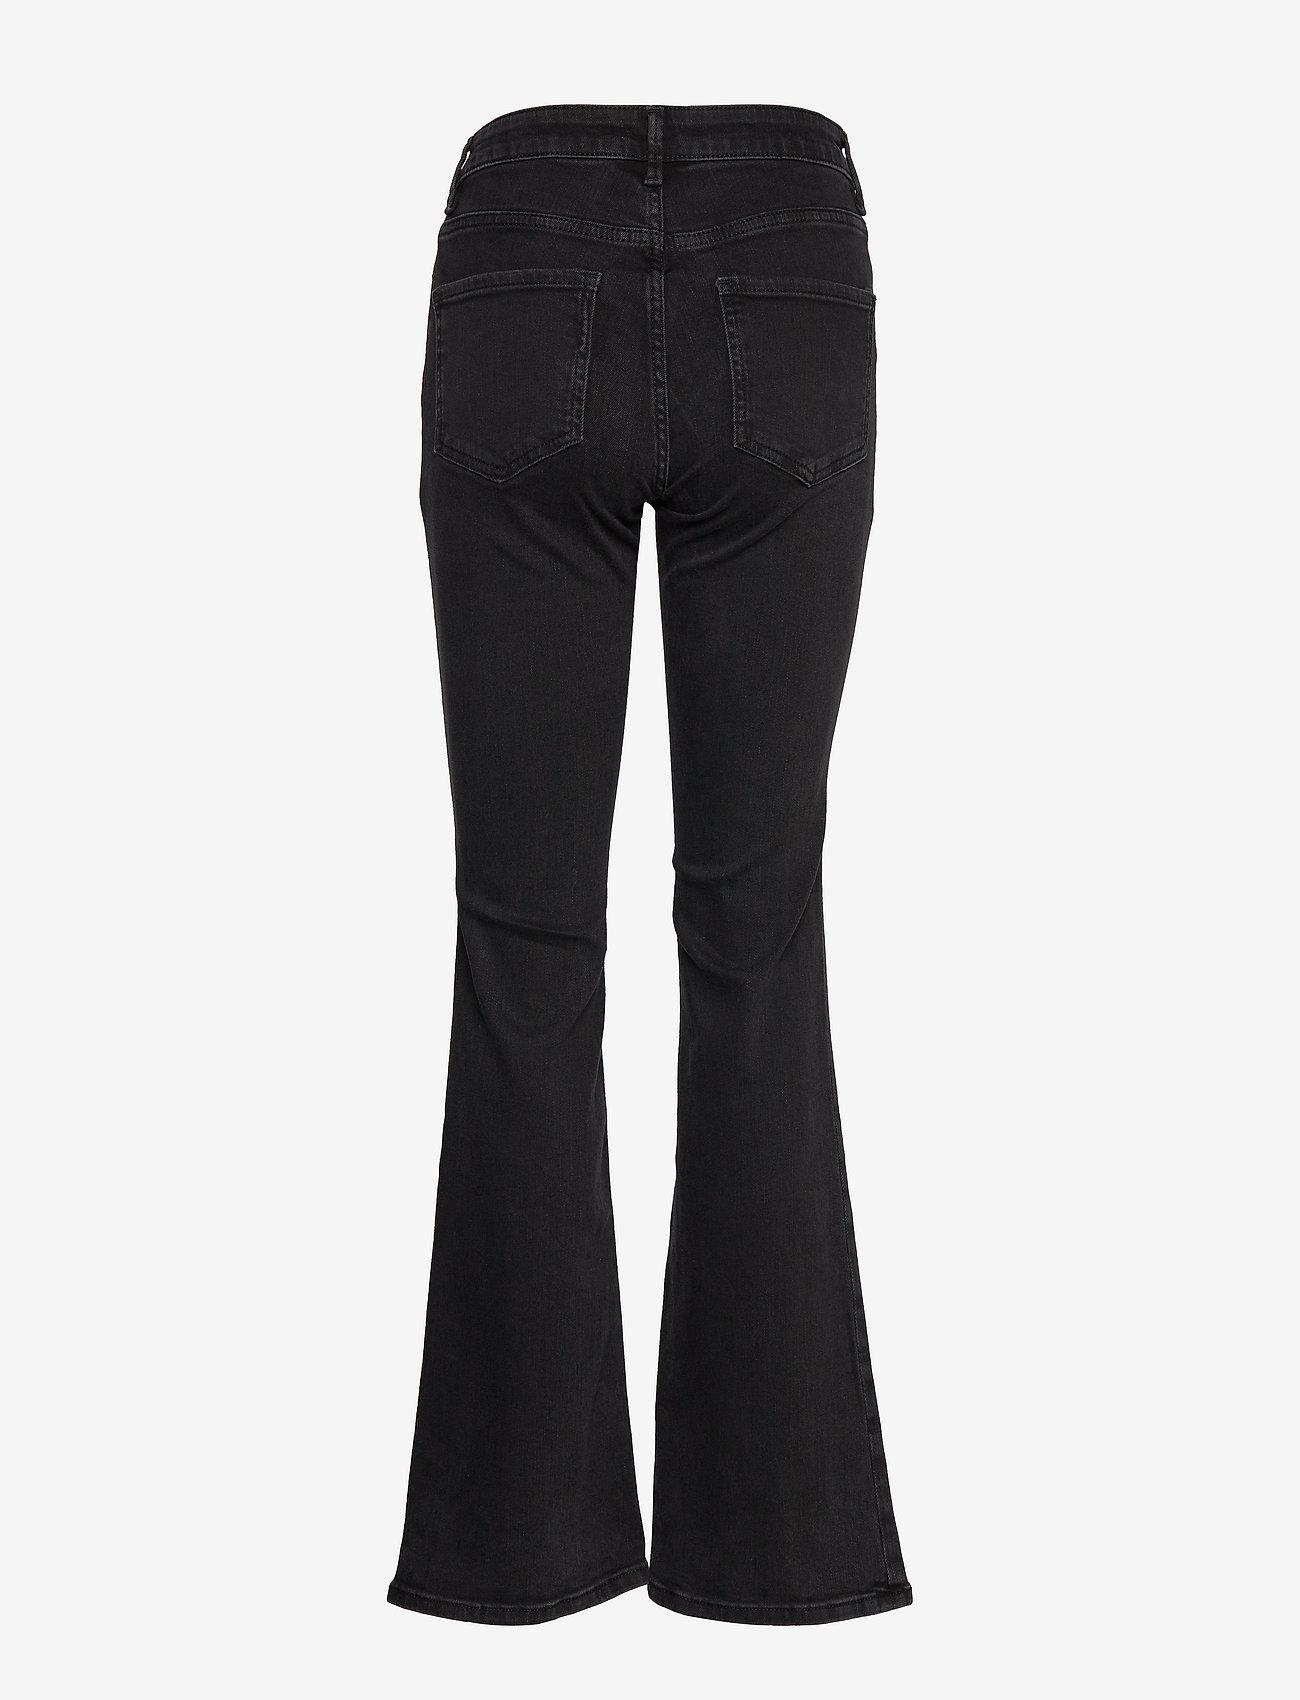 Lindex trousers denim Karen black- Jeans QwkZAMGV vaxp0 woSFlRpf